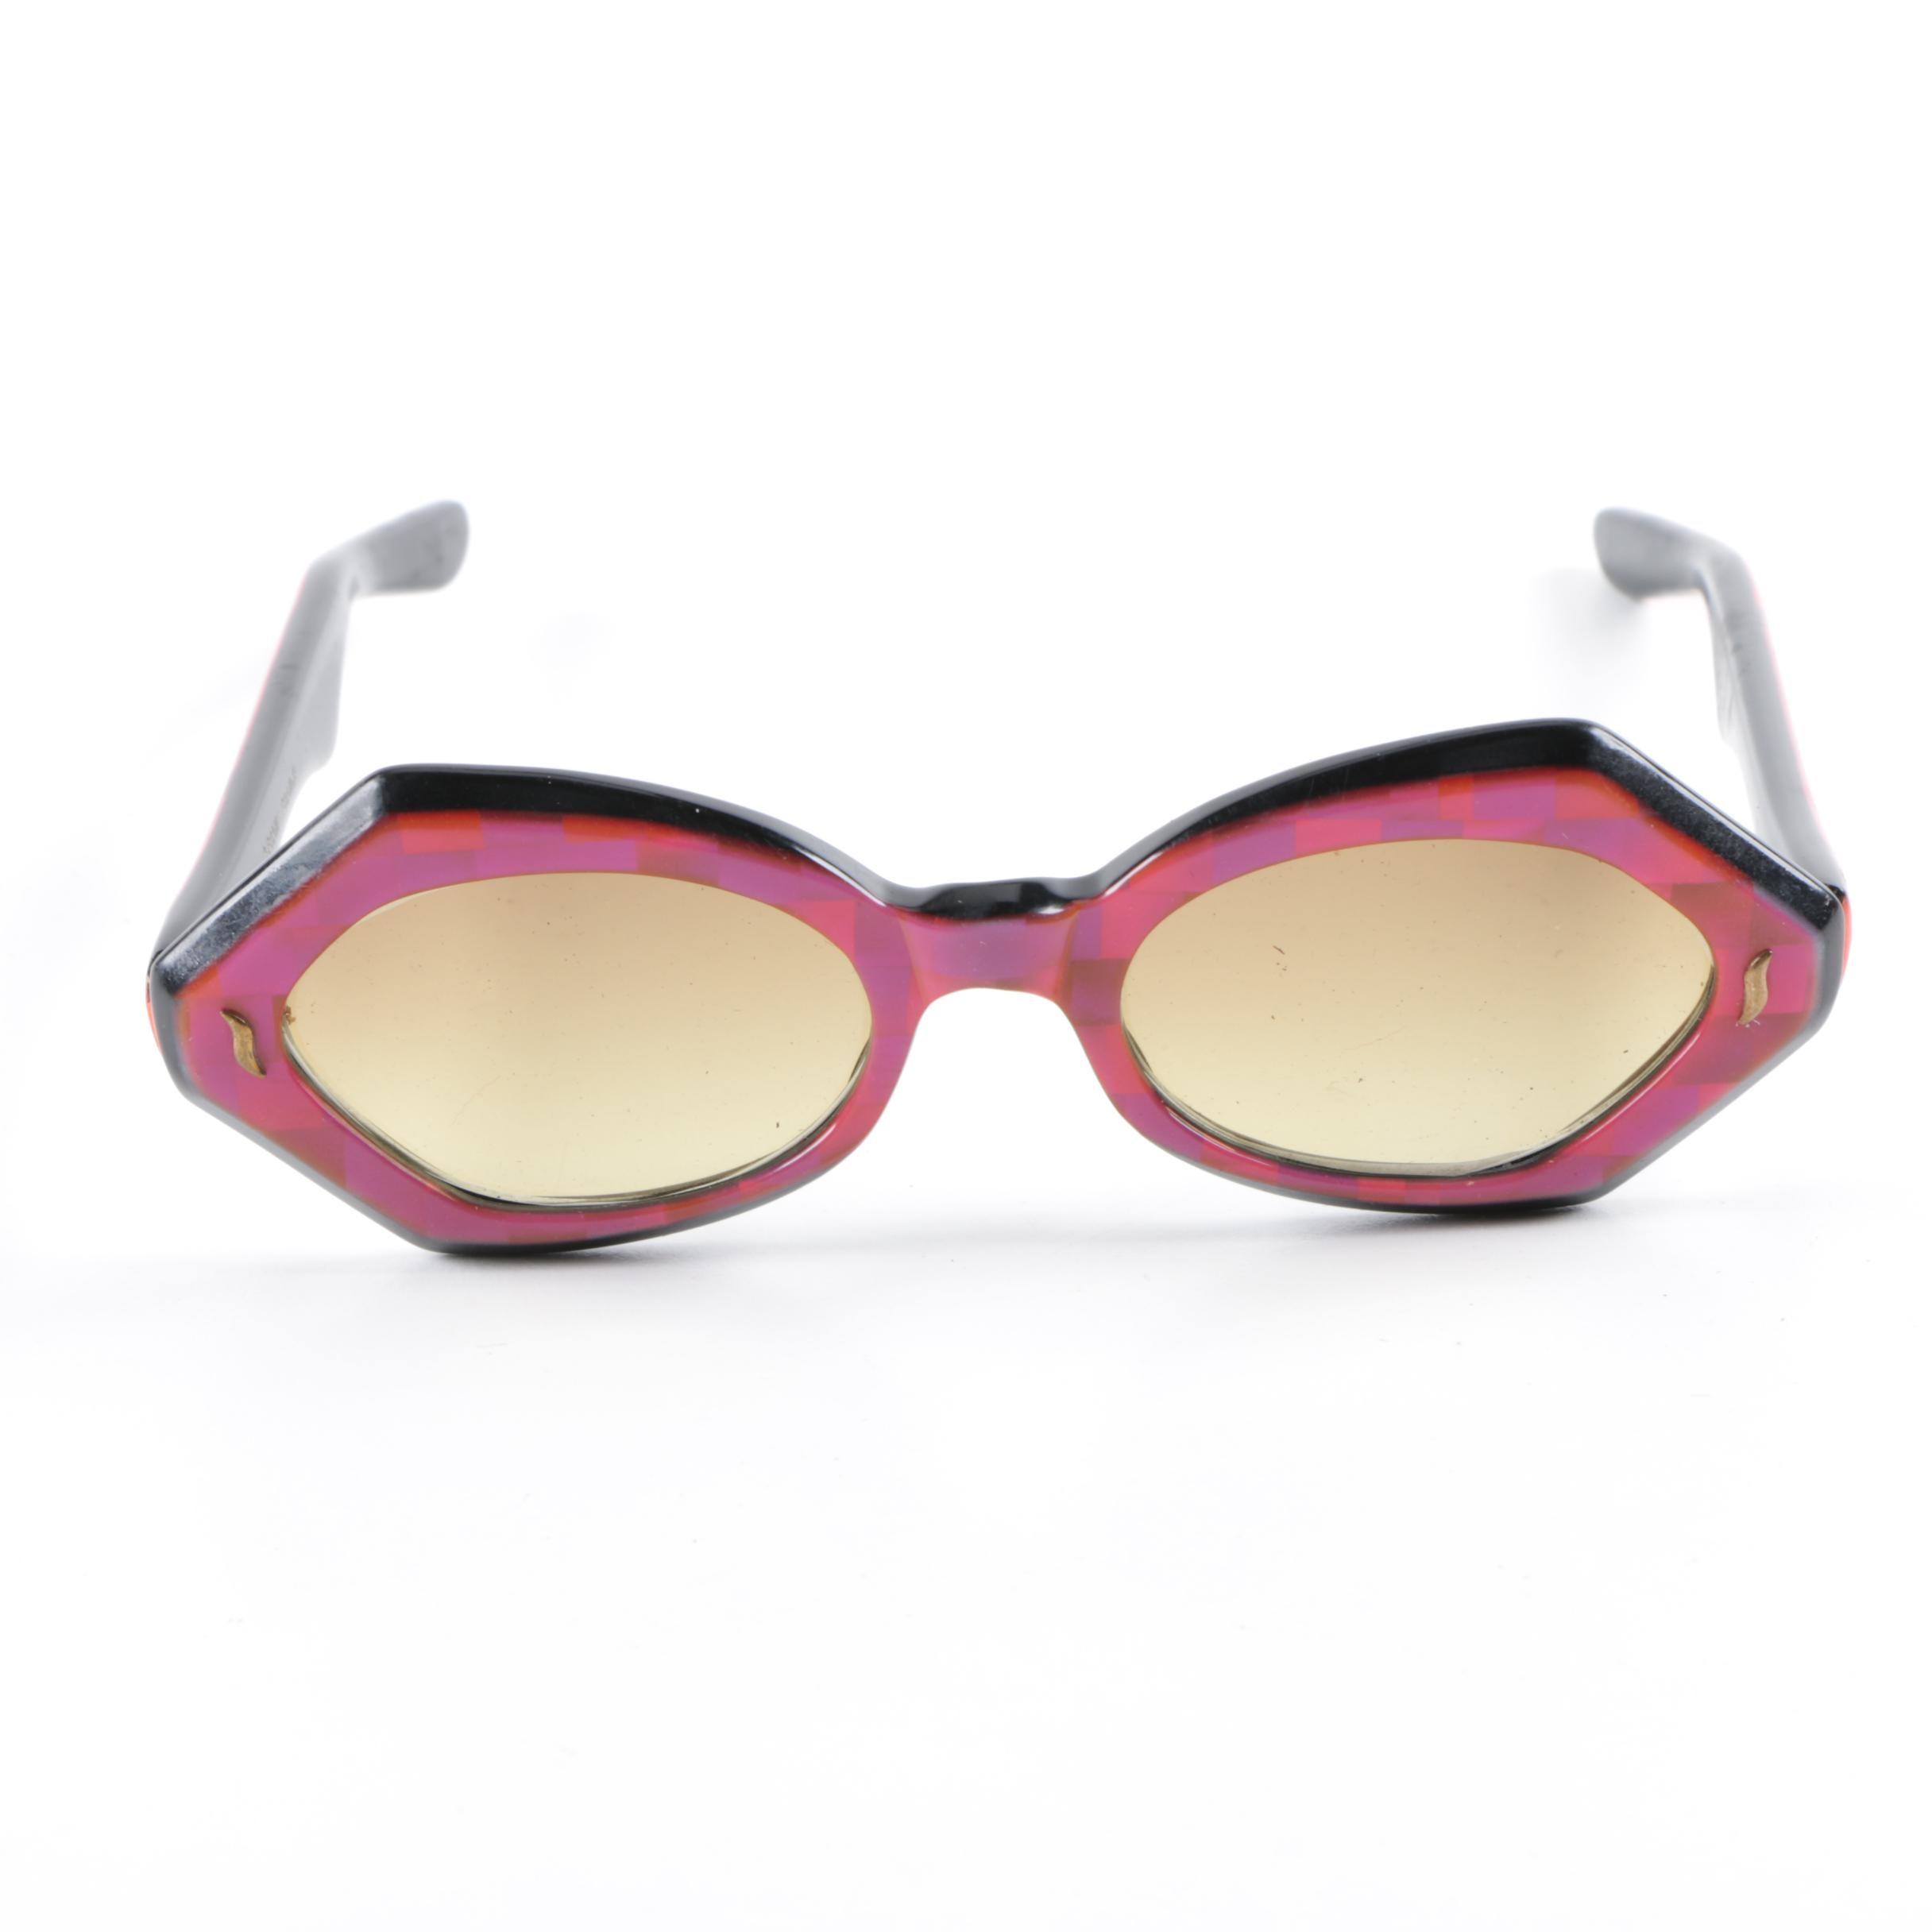 Circa 1960s Vintage French Sunglasses